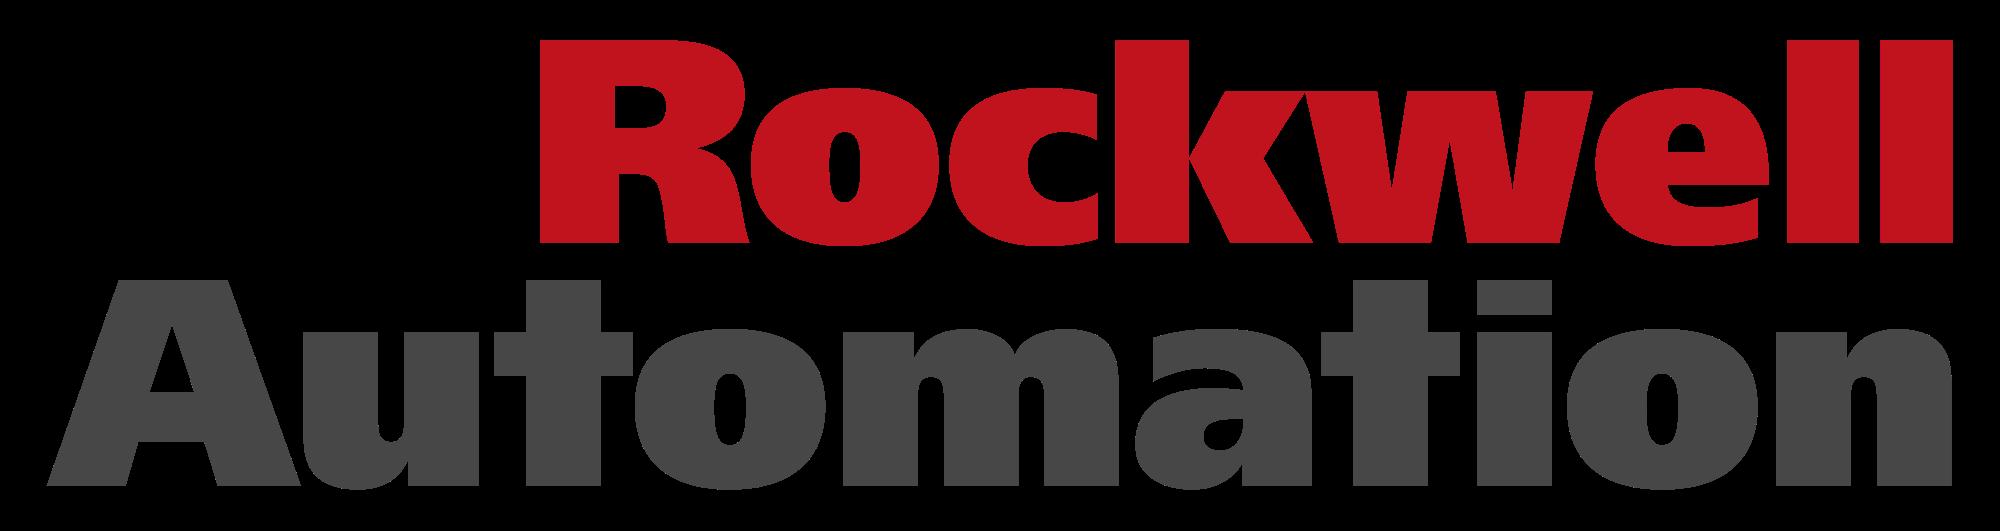 rockwell_automation_logo